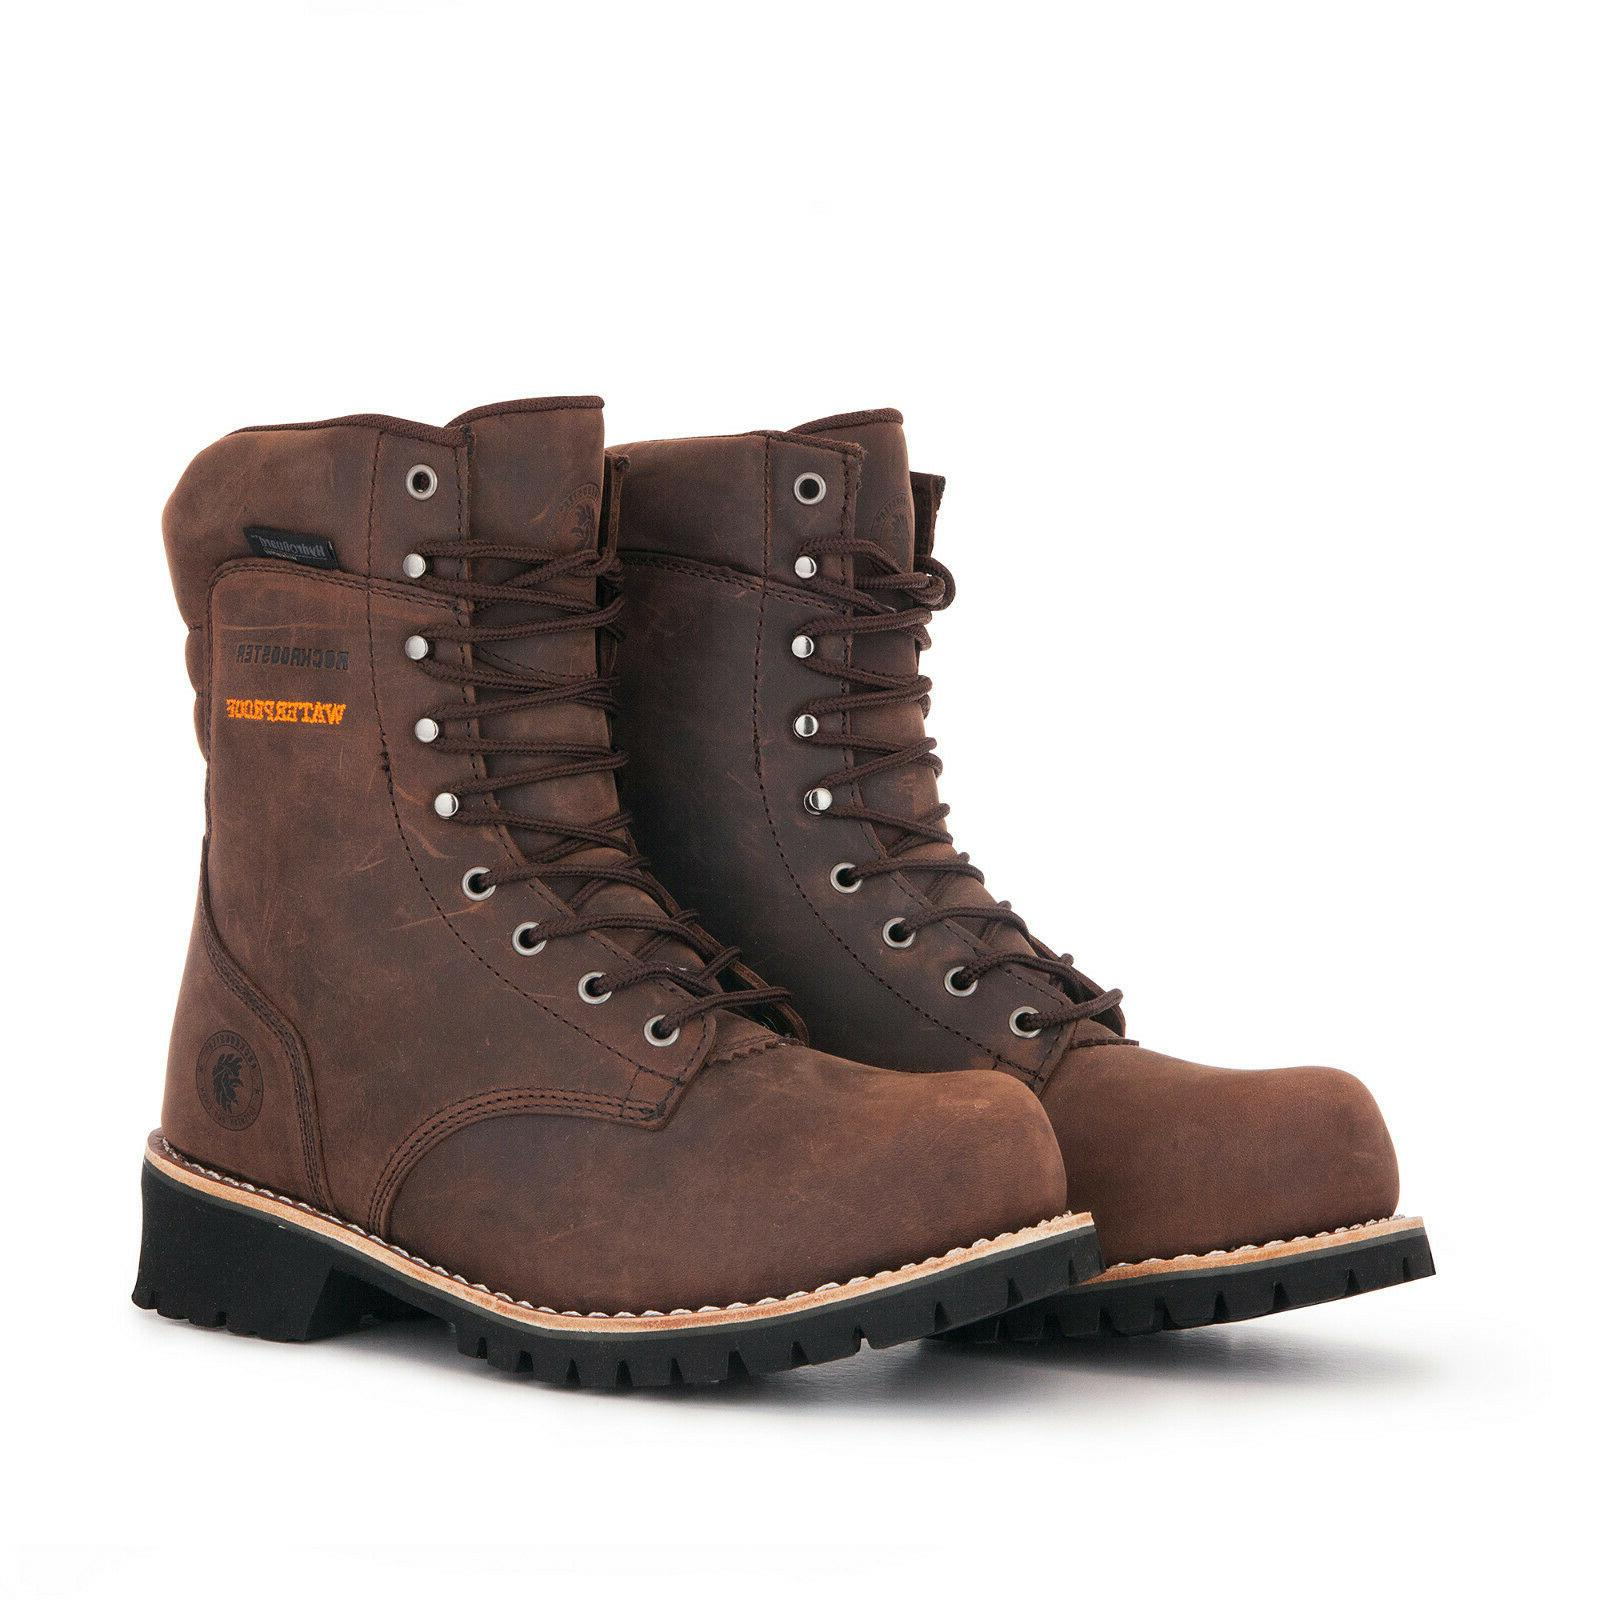 men work boots composite toe lace up